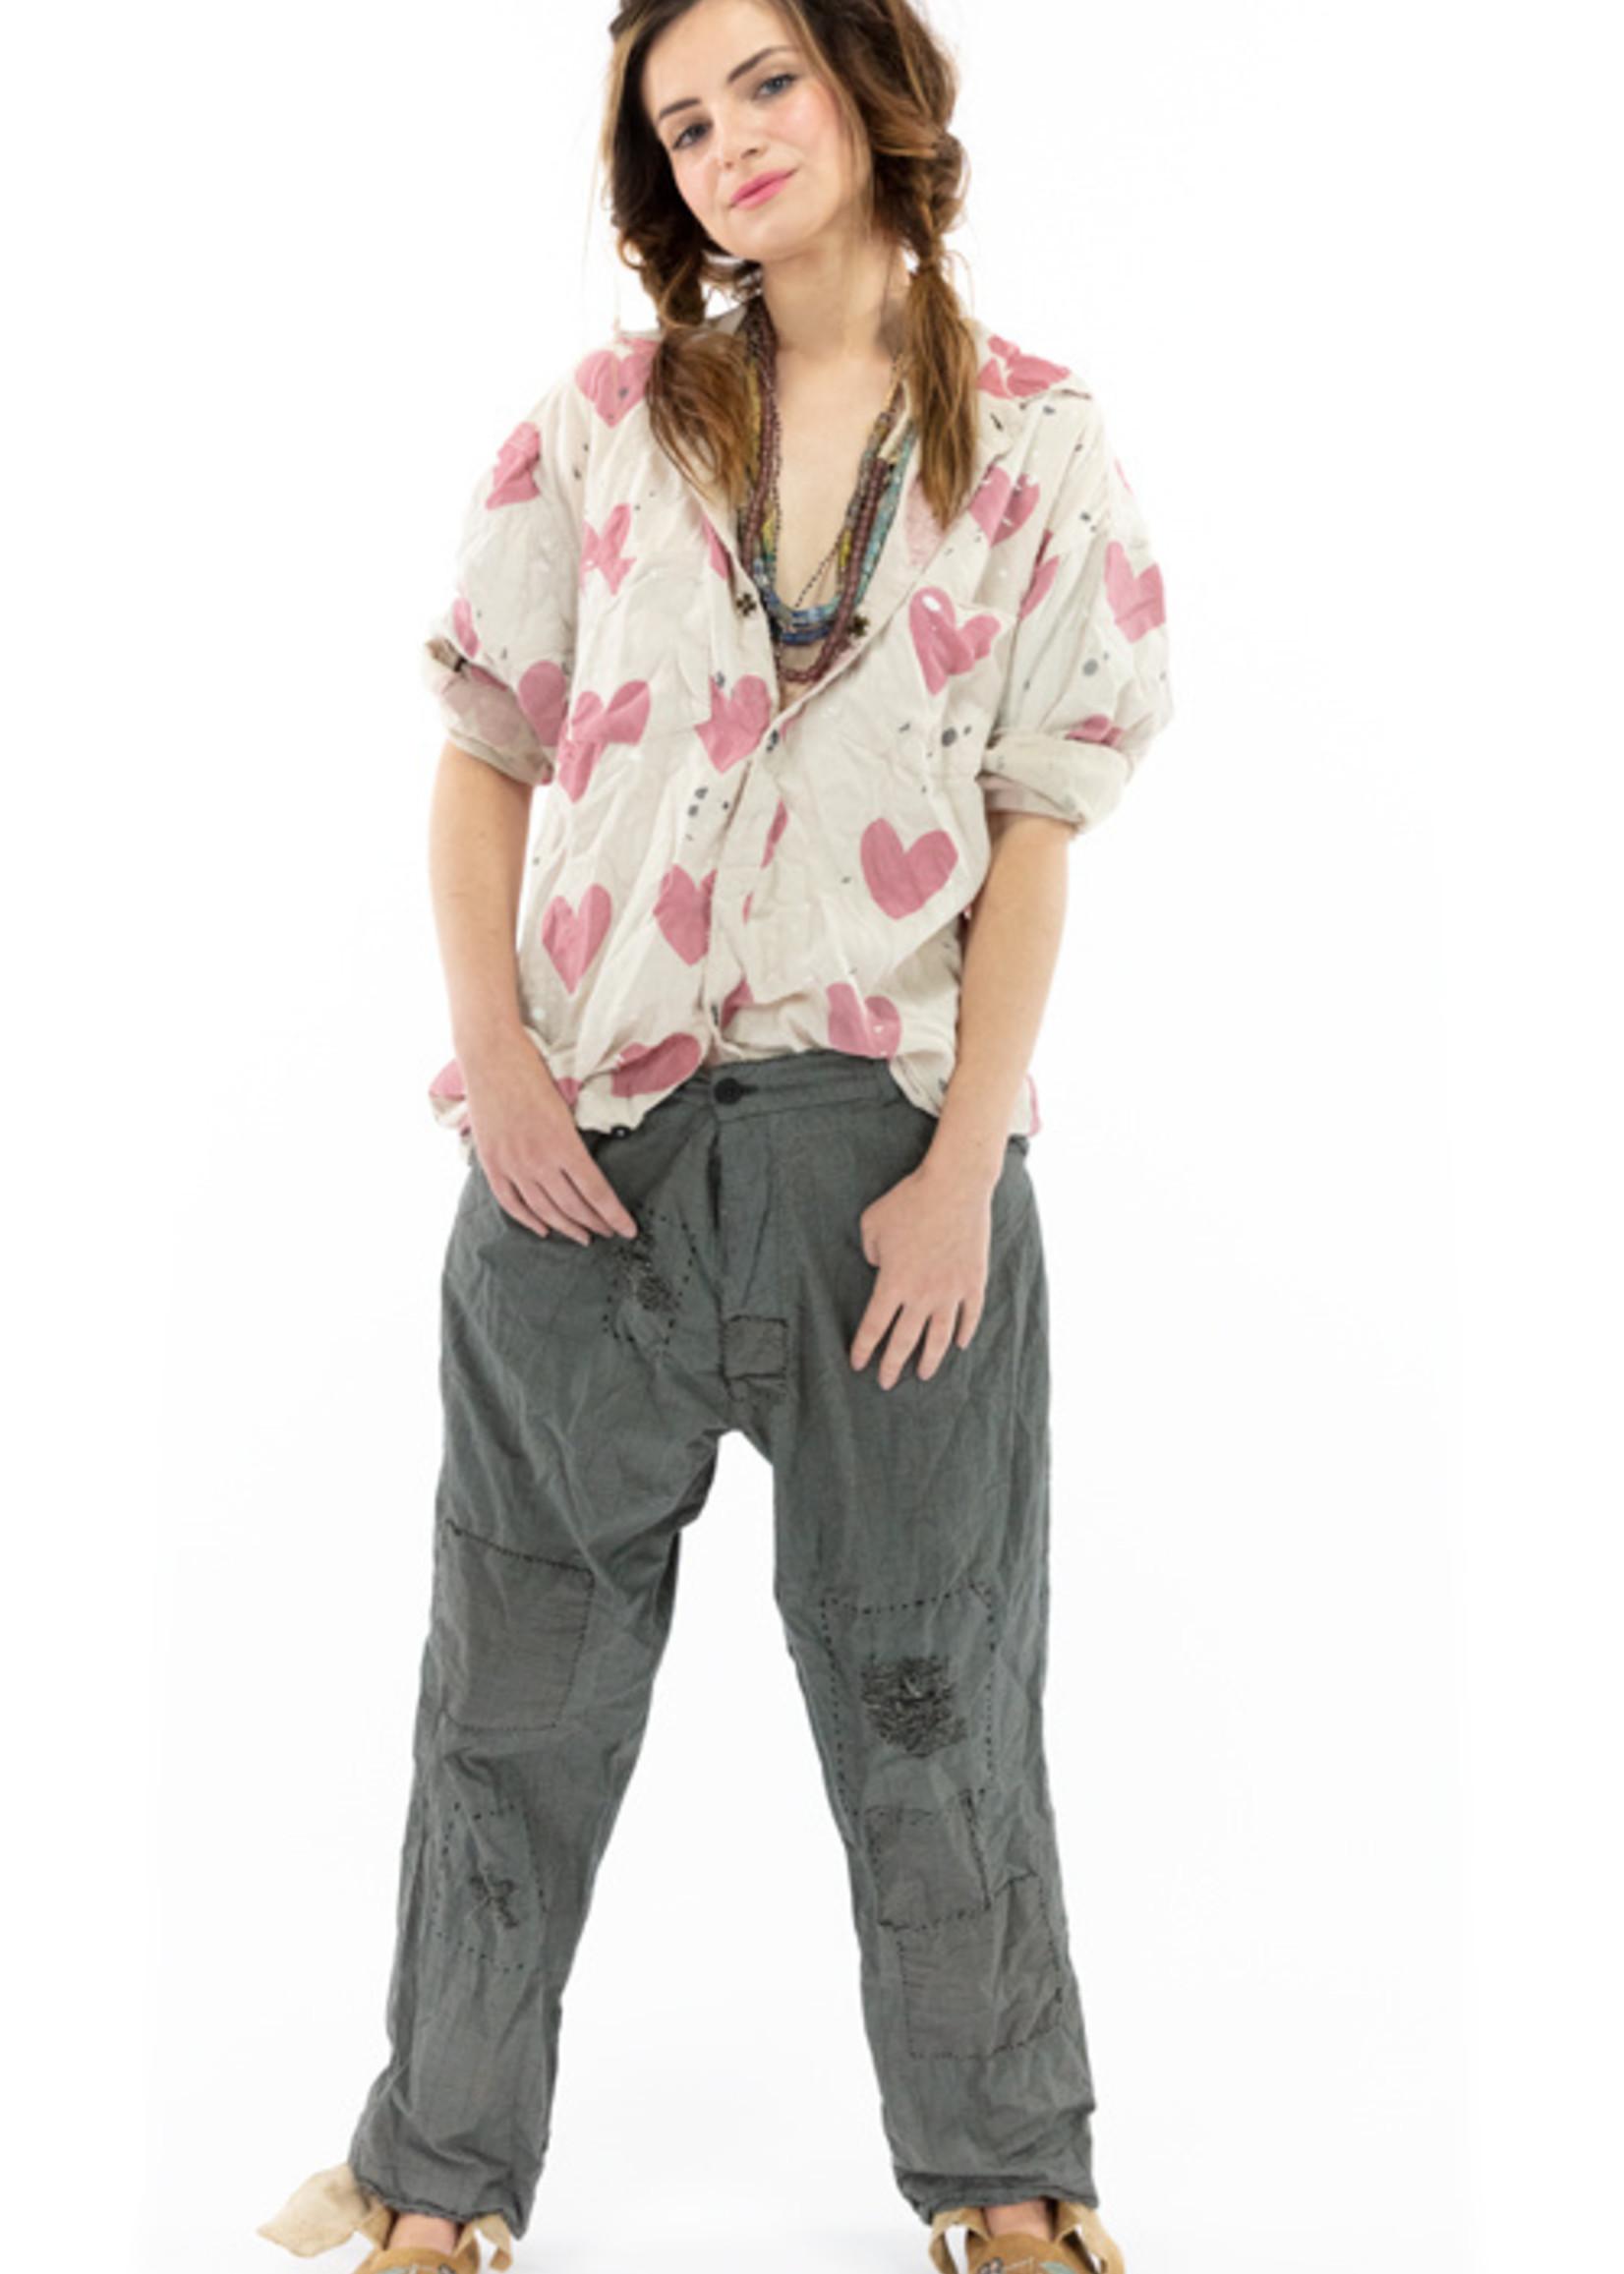 Magnolia Pearl Bobbie Trousers - Pep